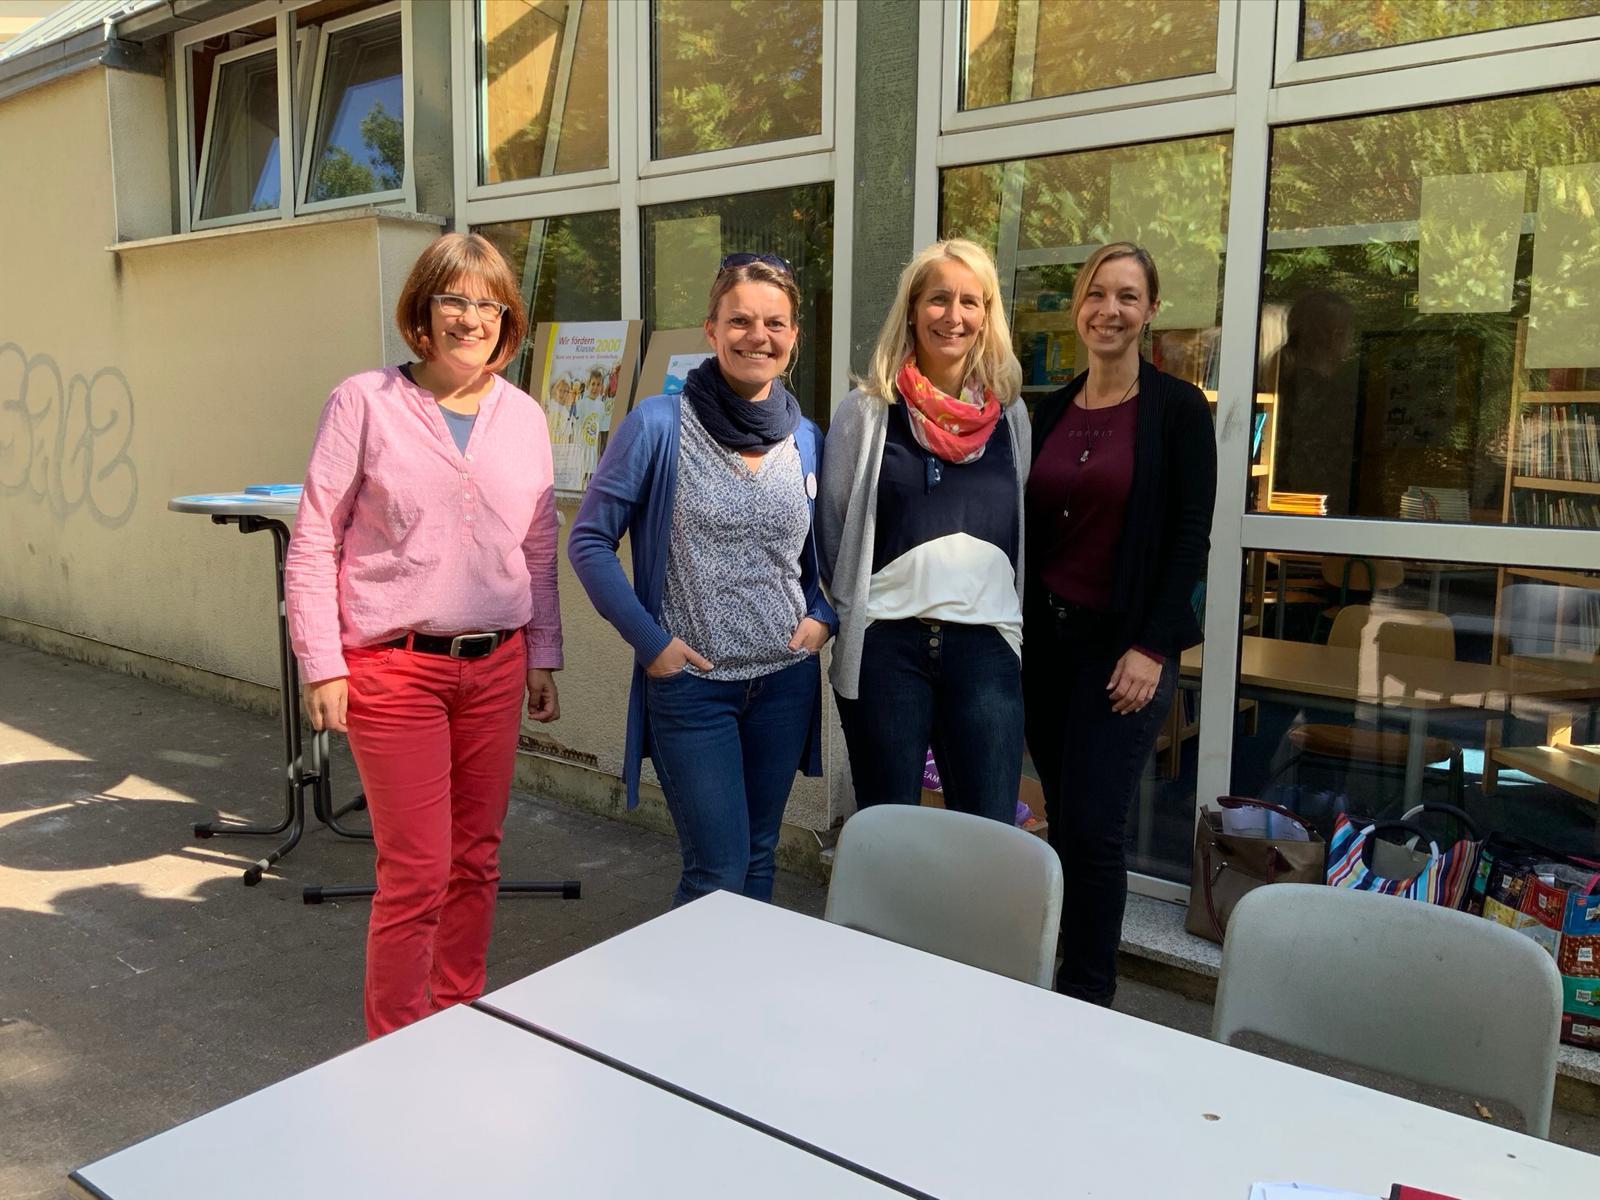 Christine Koplin, Sabina Benn, Kerstin Oesterwinter und Michaela Opfermann